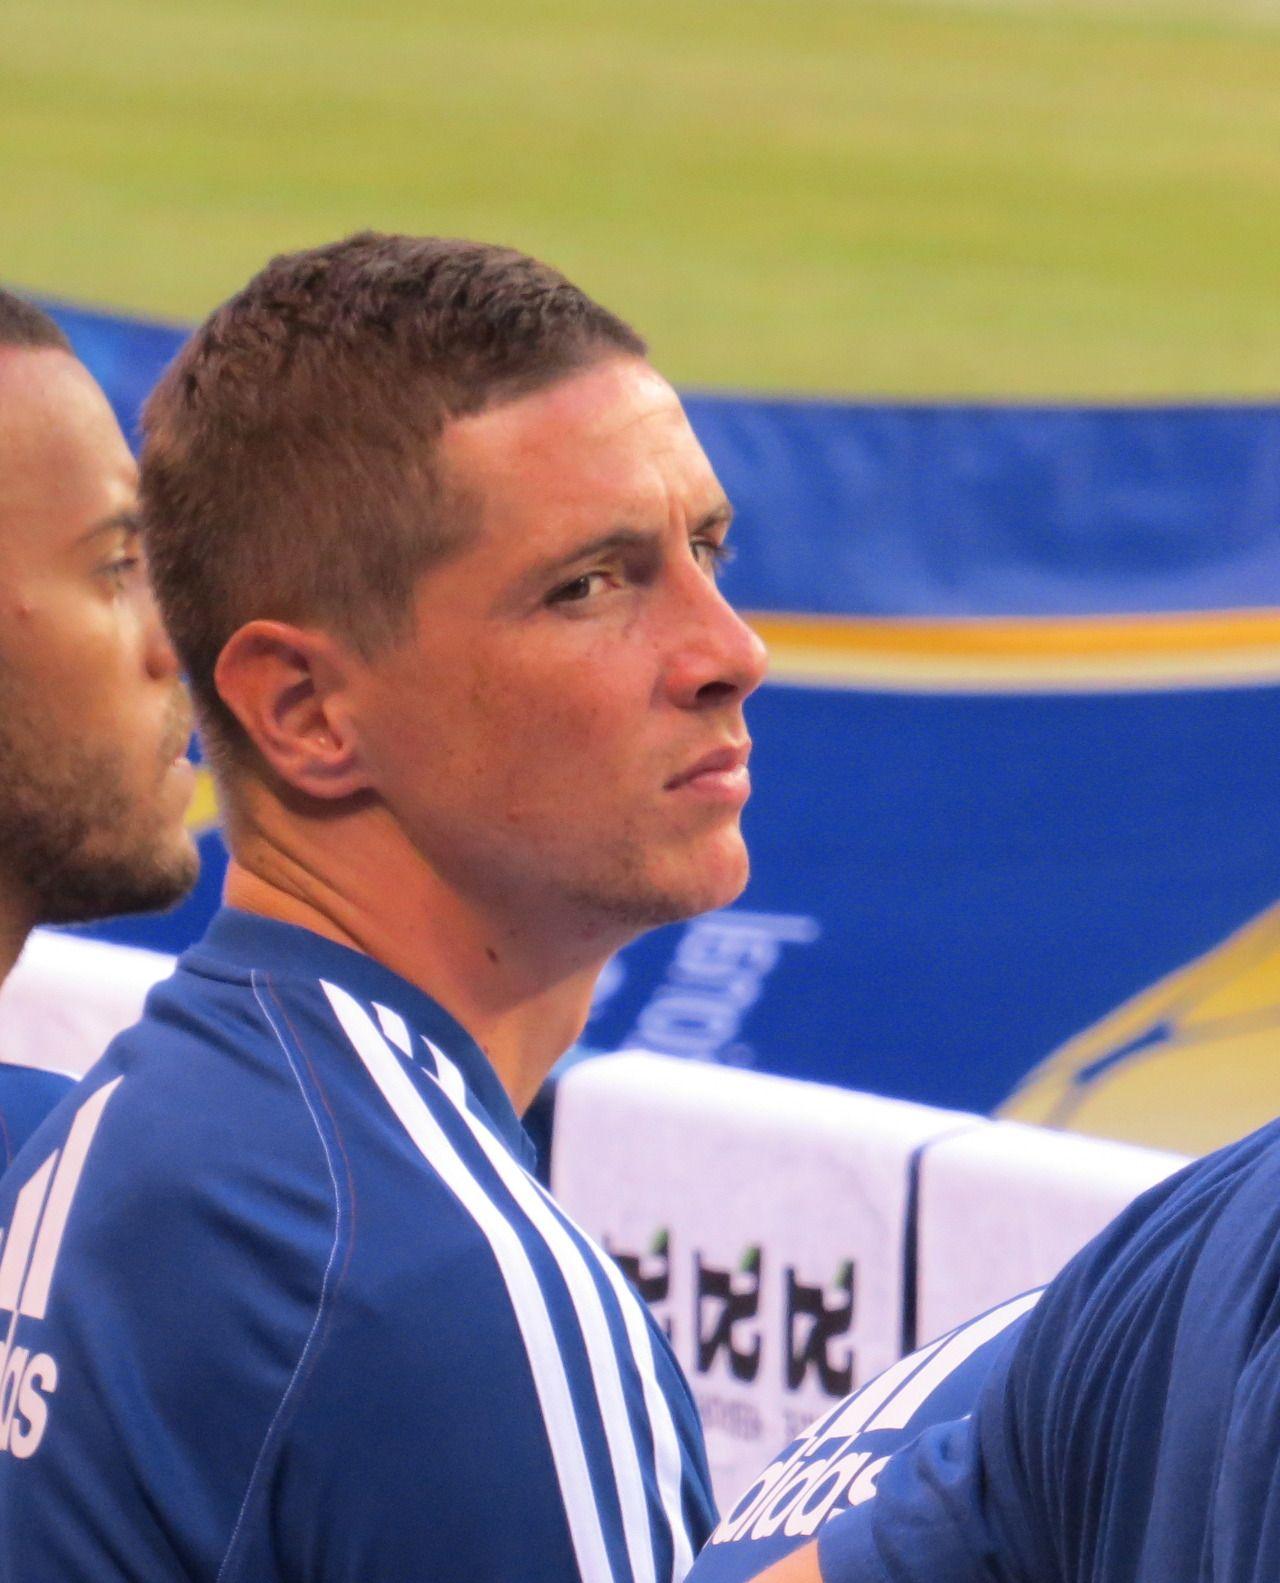 Fernando Torres. Chelsea 2-0 Internazionale. International Champions Cup. Thursday, August 1, 2013.